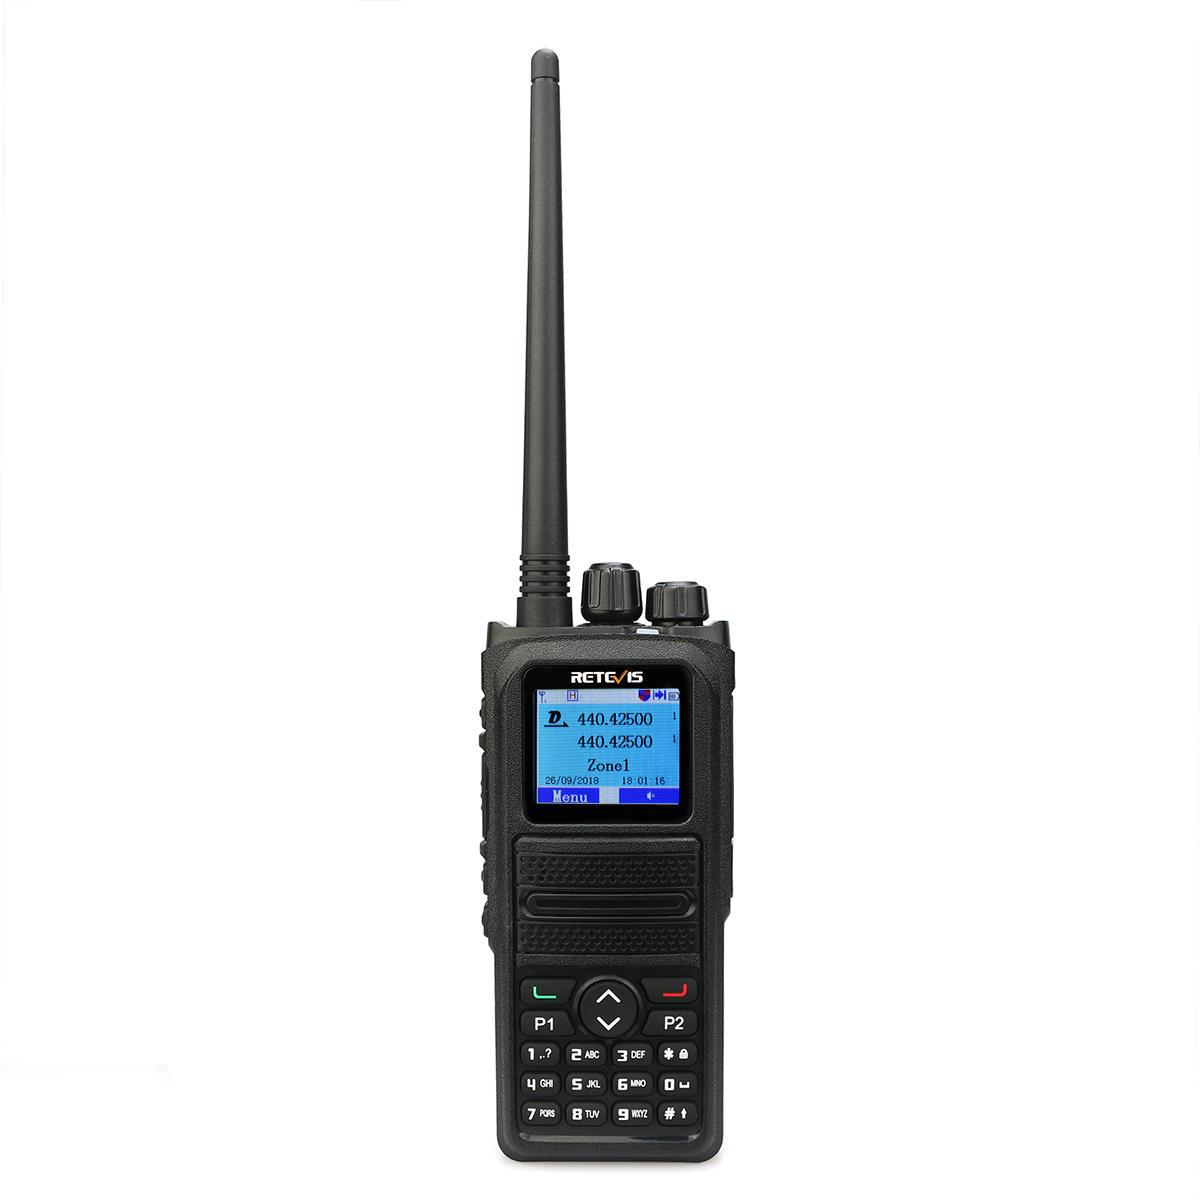 Retevis RT84 DMR Dual Band Walkie Talkie 5W VHF UHF DMR Digital/Analog Two-way Radio Transceiver